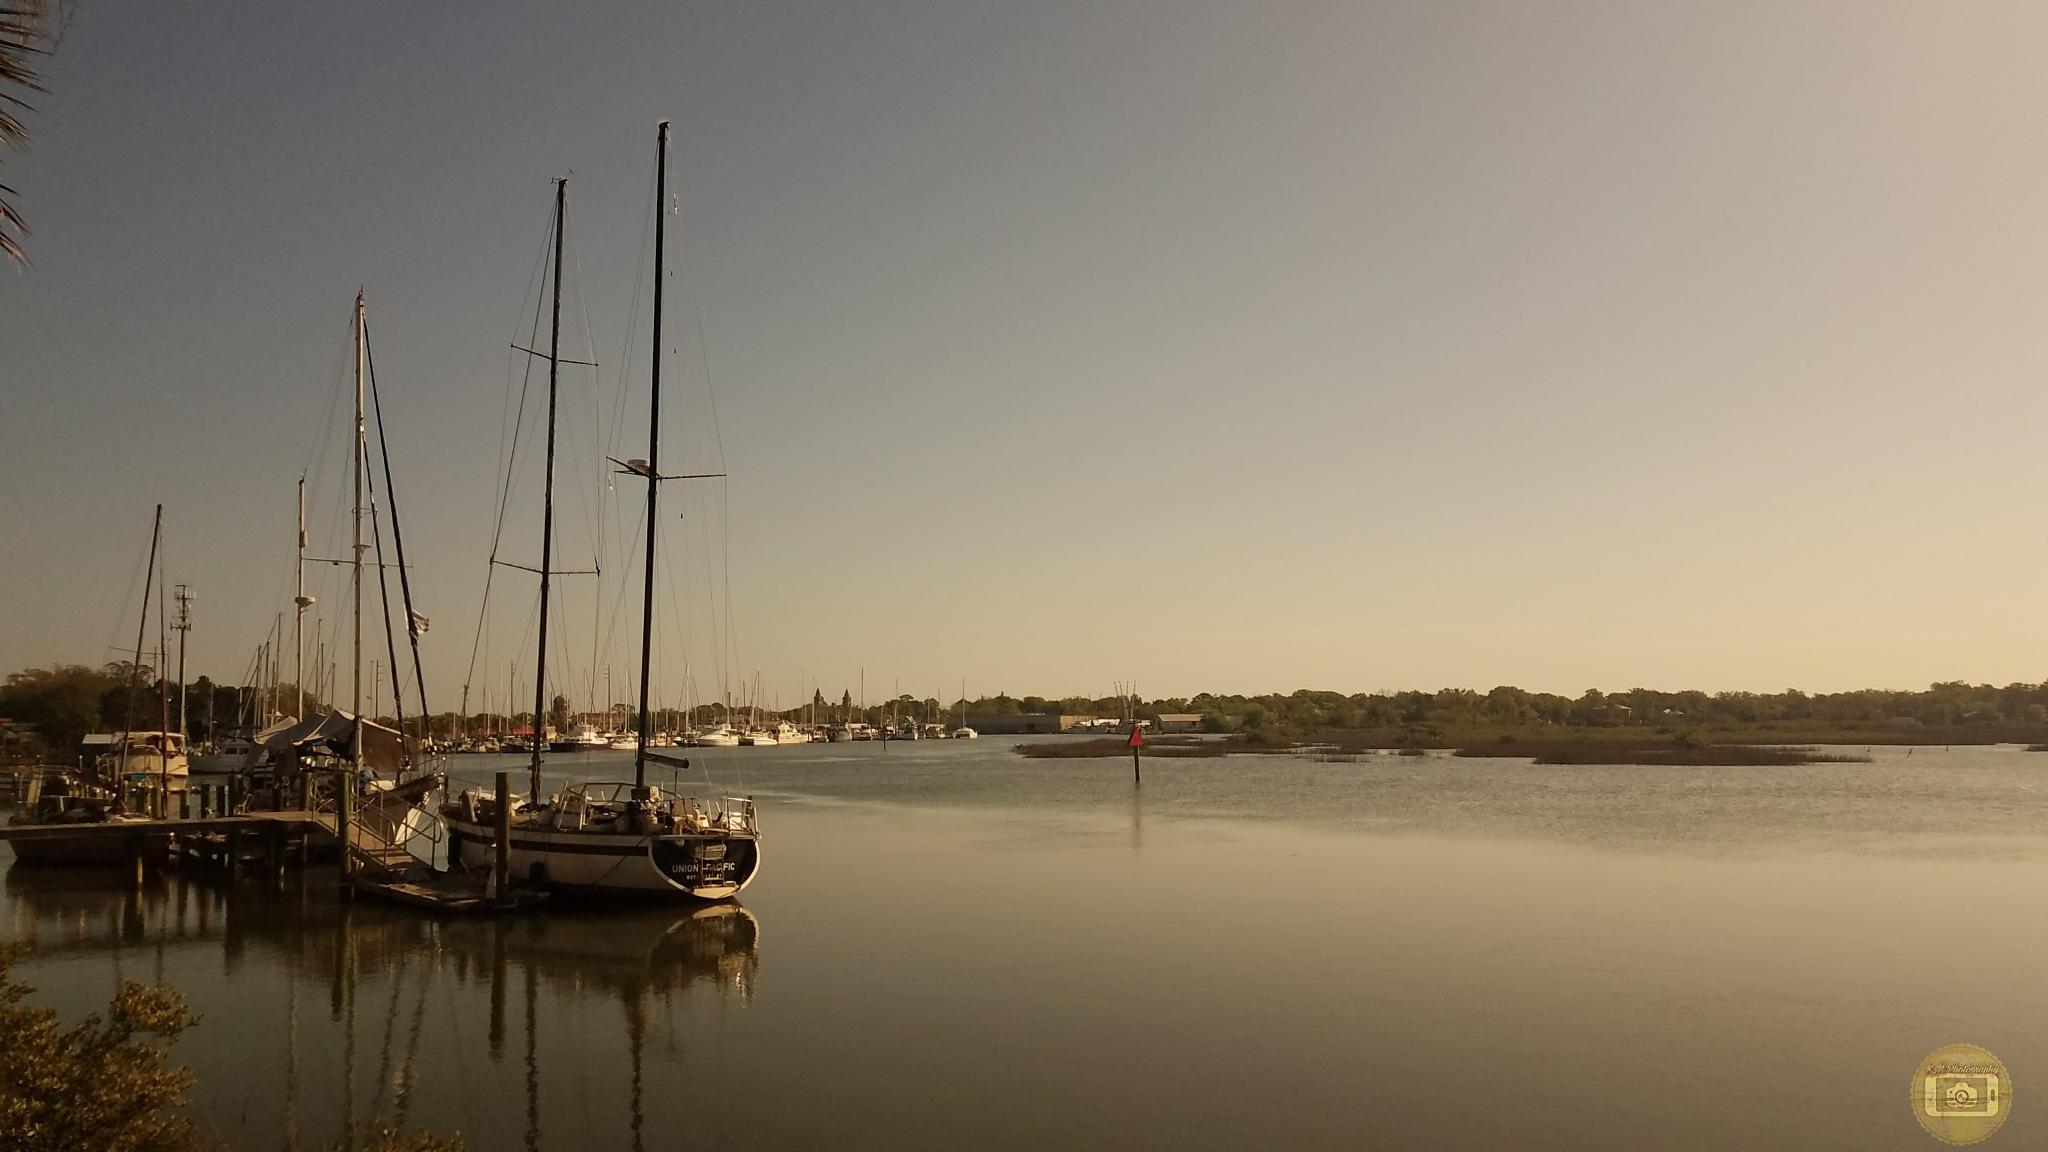 Docked Boats  by KMPhotography